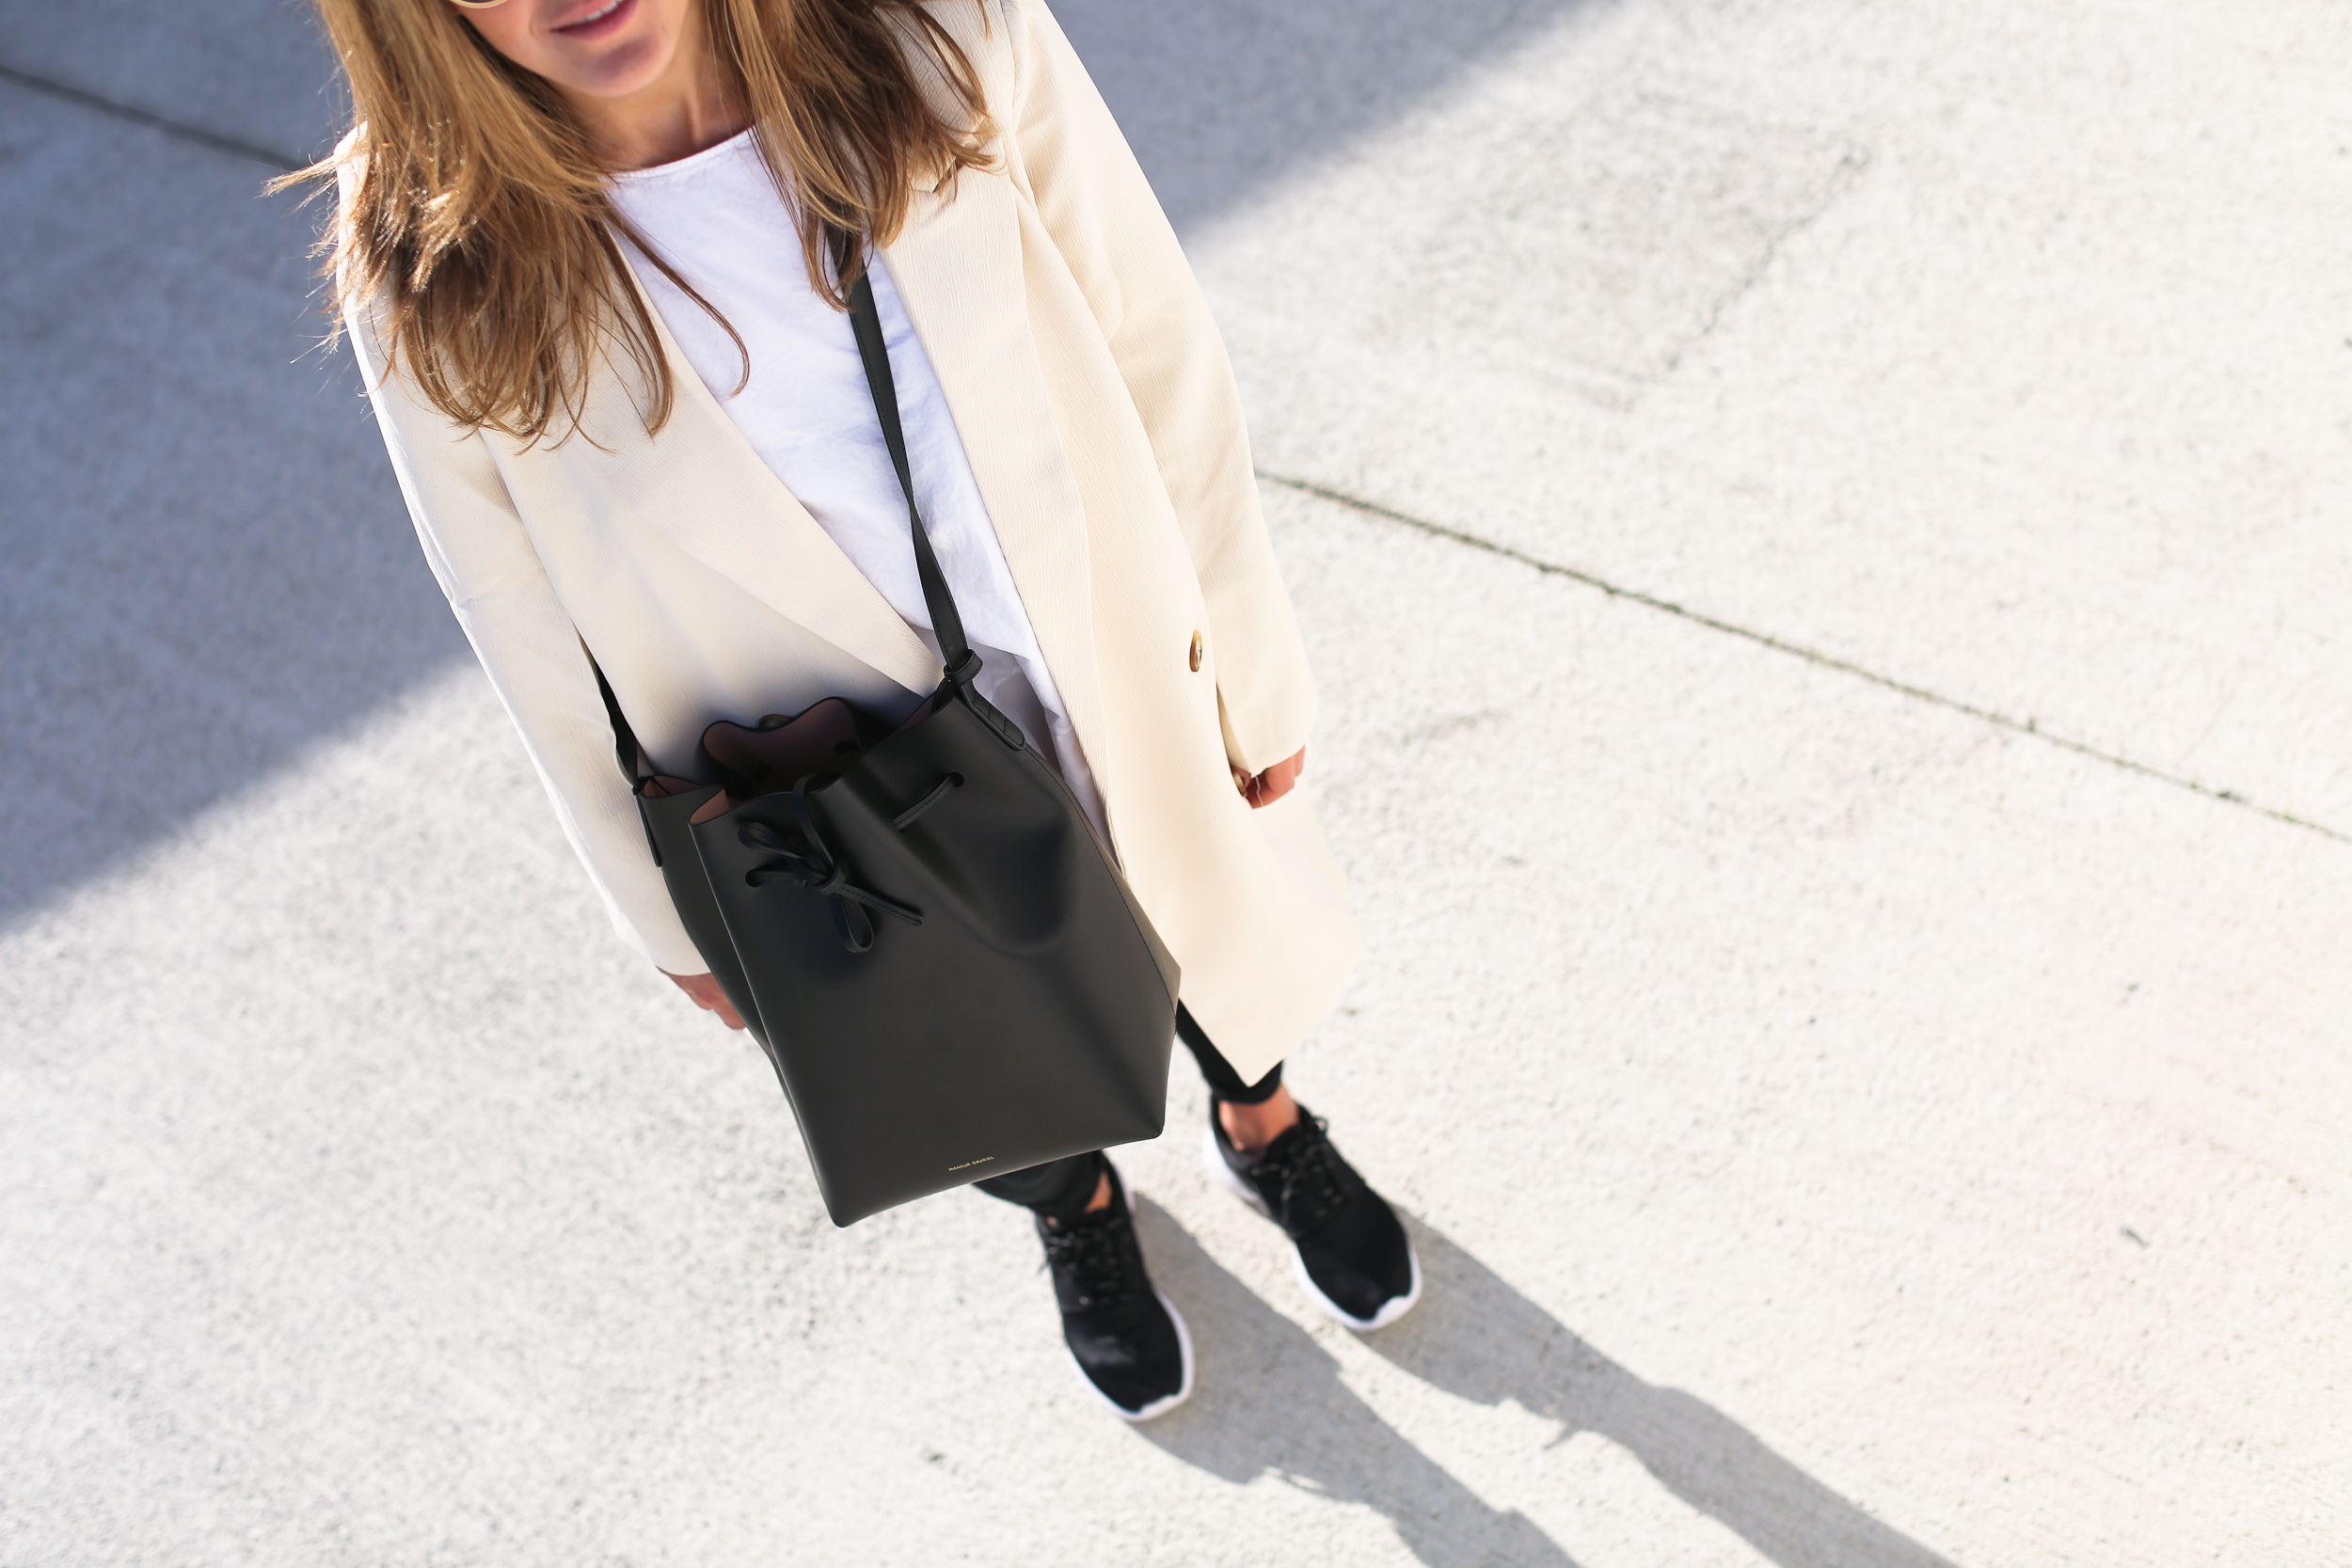 Clochet_streetstyle_chicwish_long_white_blazer_nike_roshe_one_leztinstreet_mansur_gavriel_bucket_bag-8